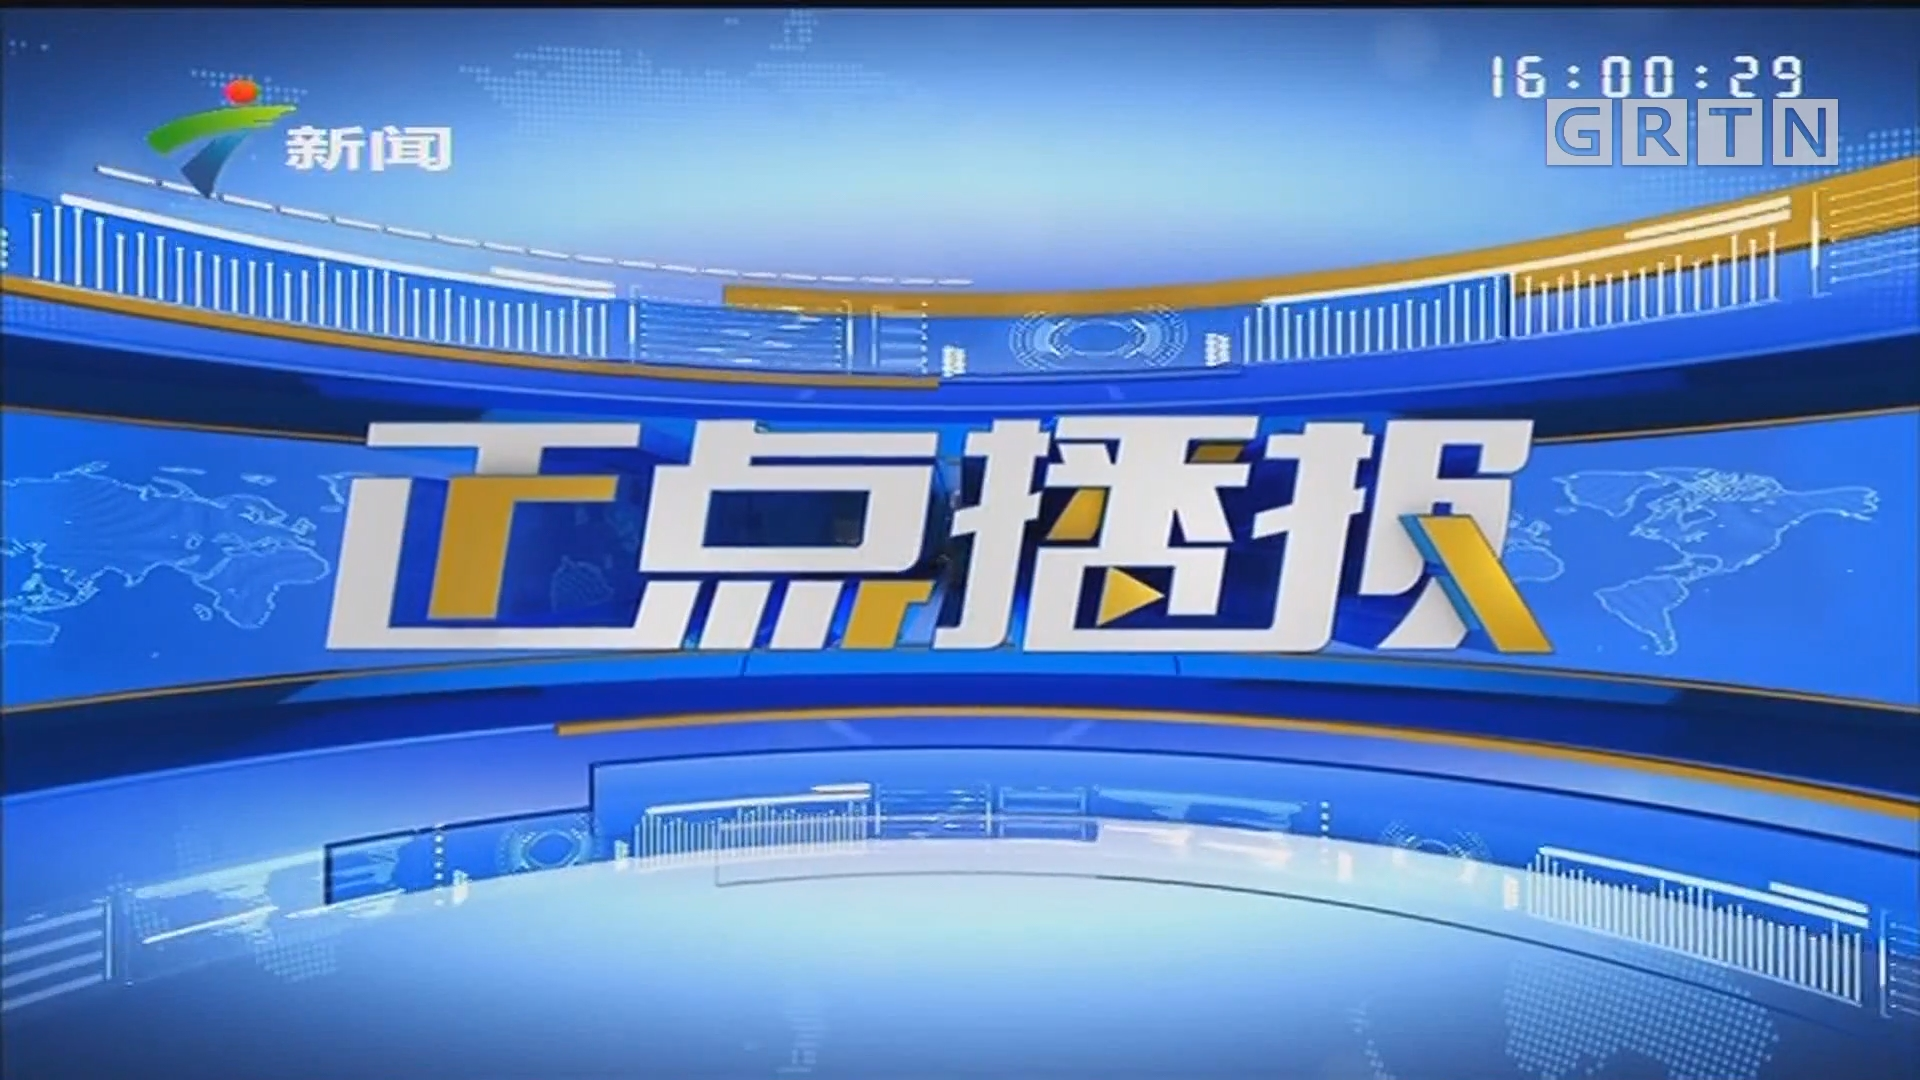 [HD][2019-08-19]正点播报:深圳:六旬老人海边轻生 武警战士跳海救人